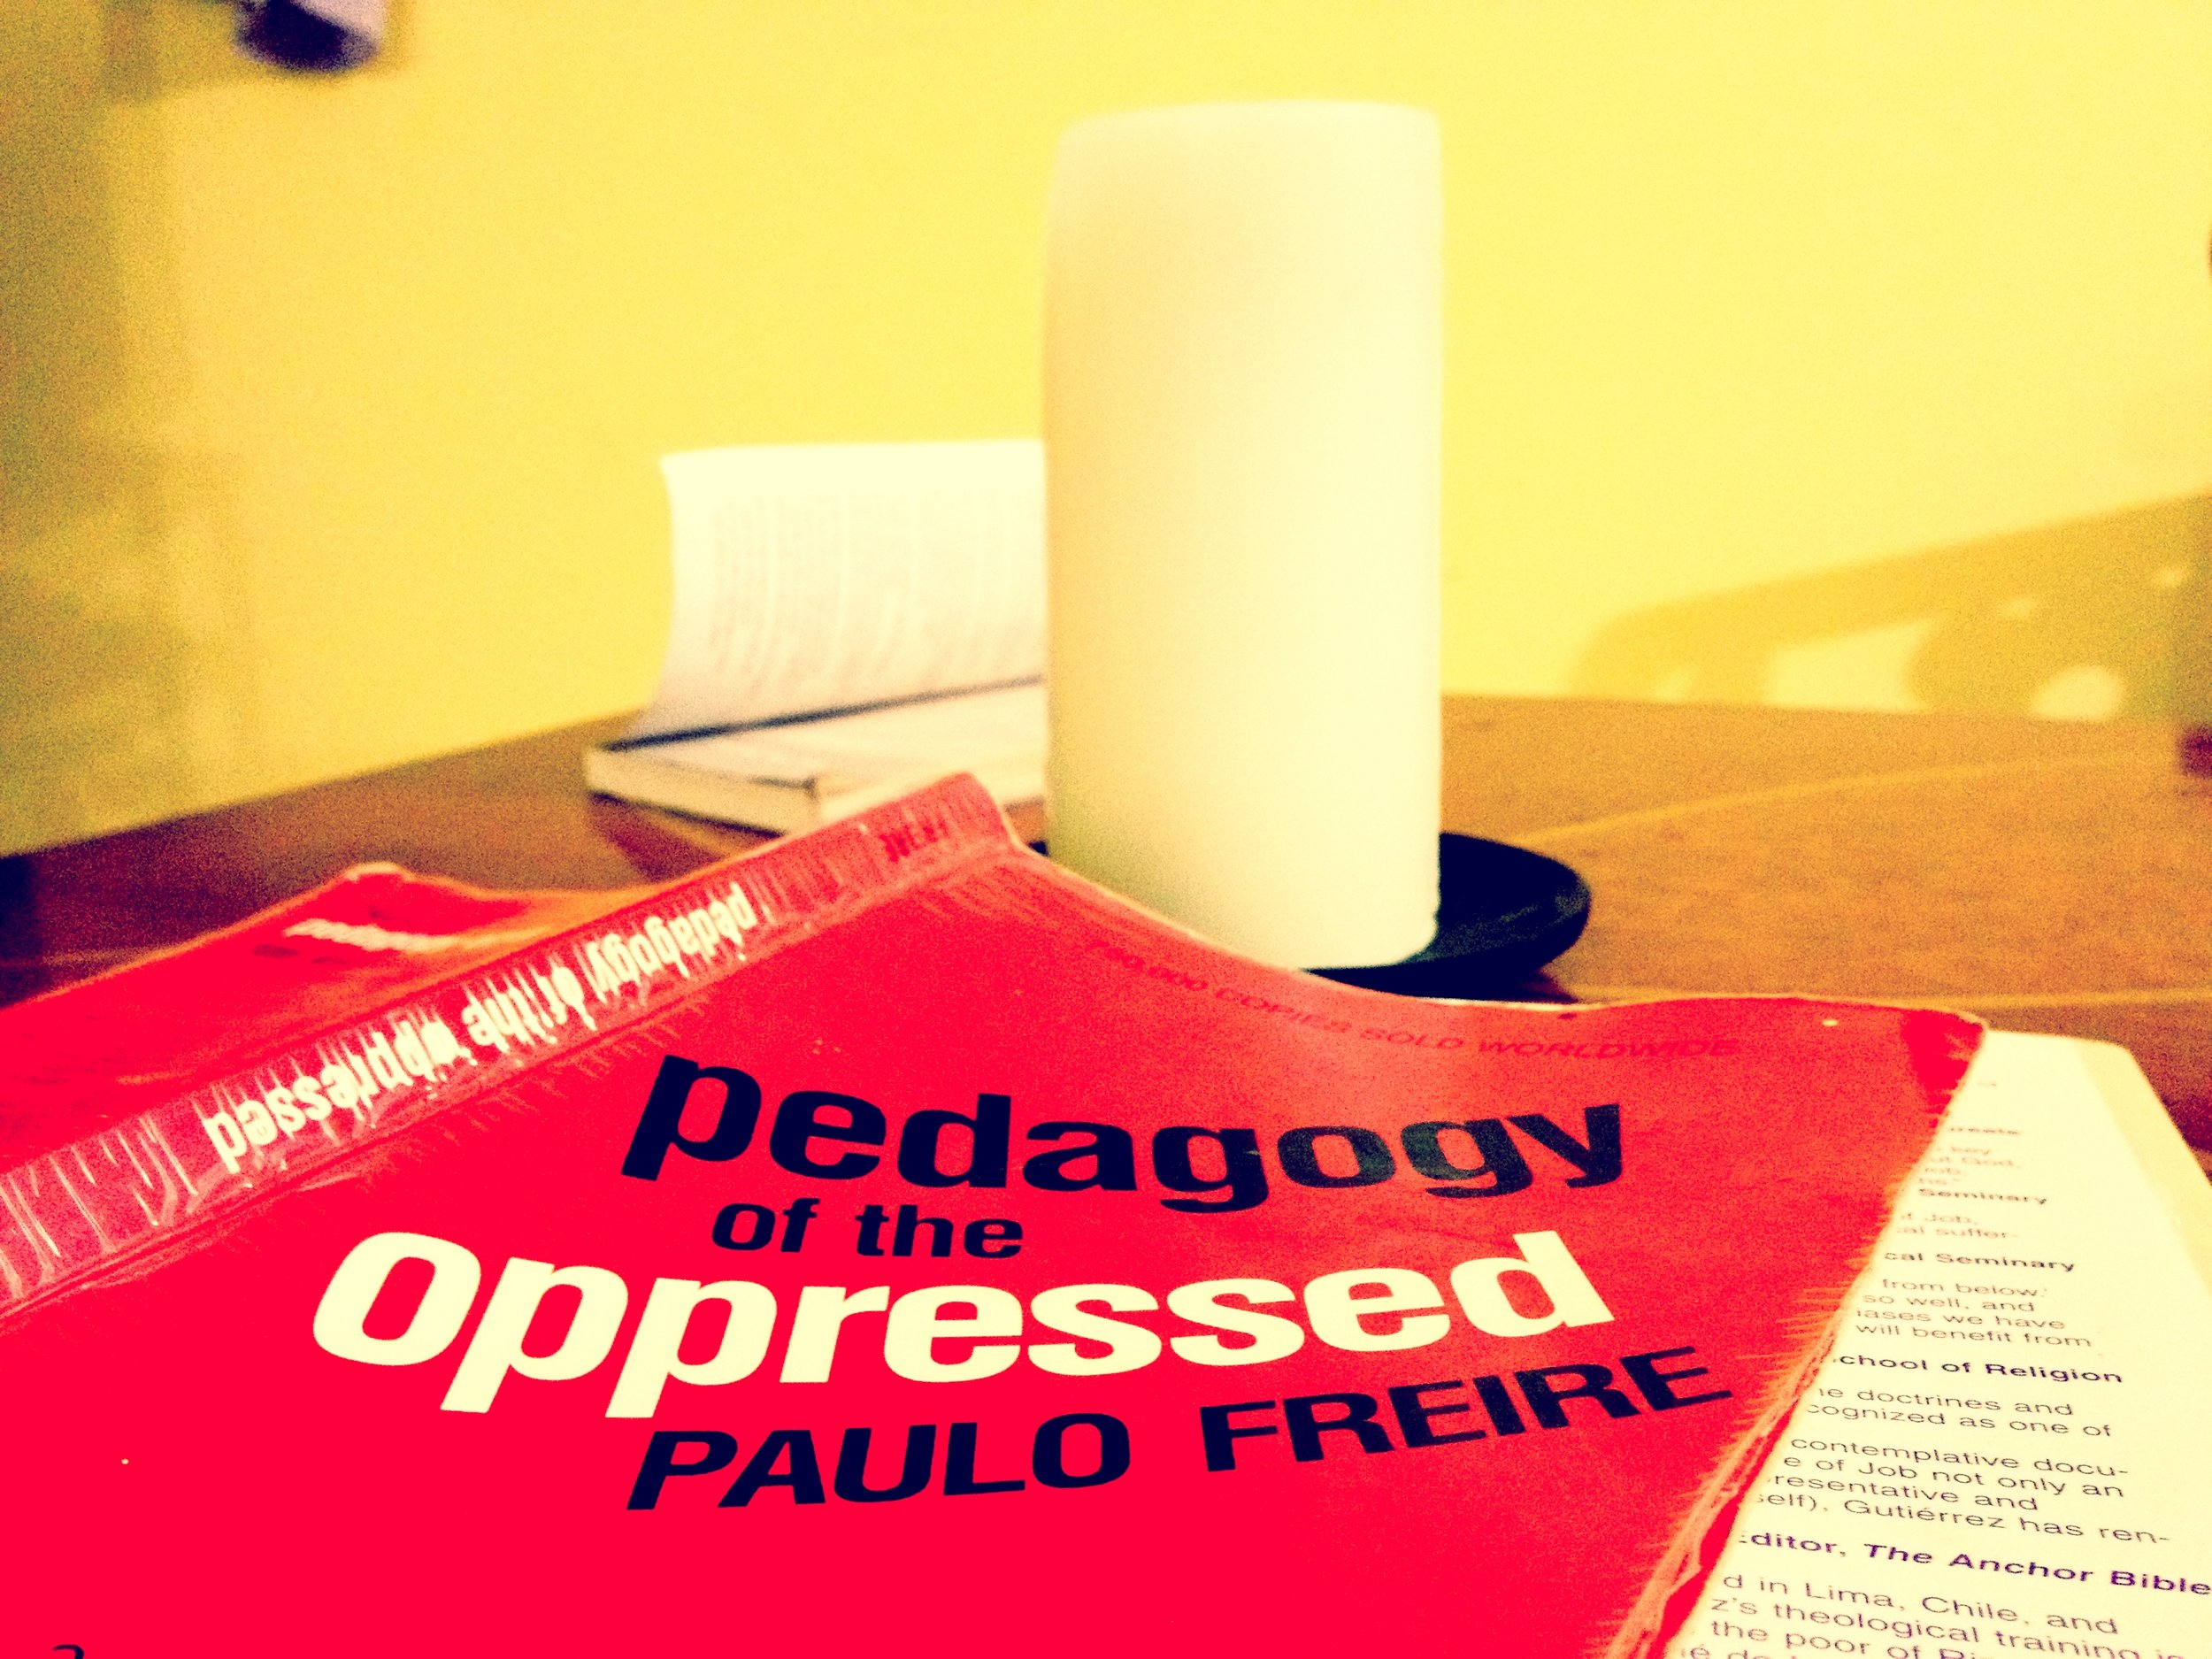 pedagogyoftheoppressed.jpg